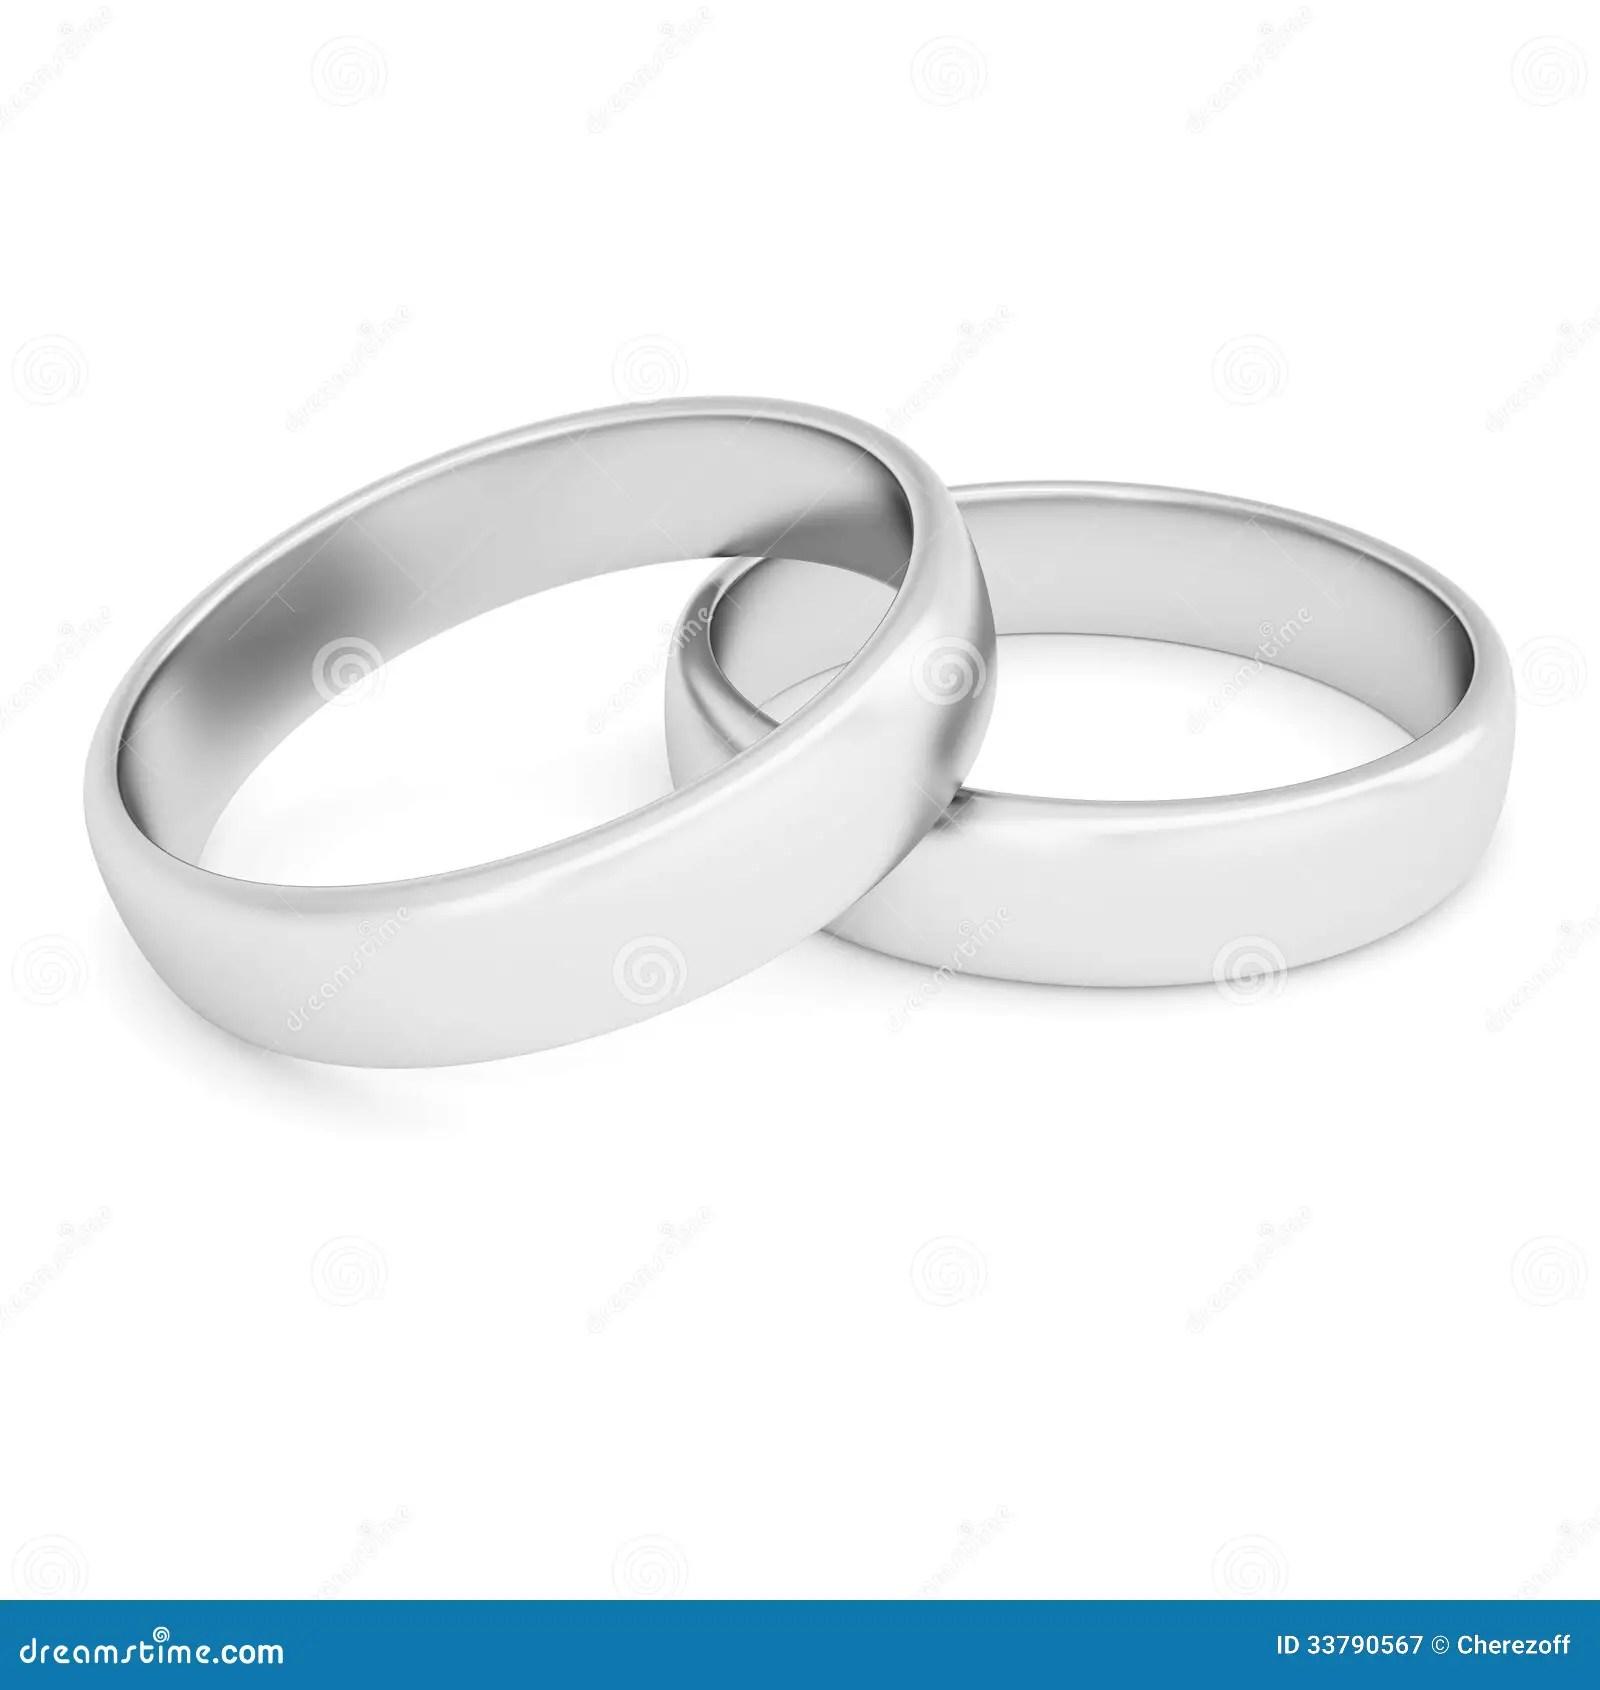 Zwei Silberne Ringe Lizenzfreie Stockfotografie  Bild